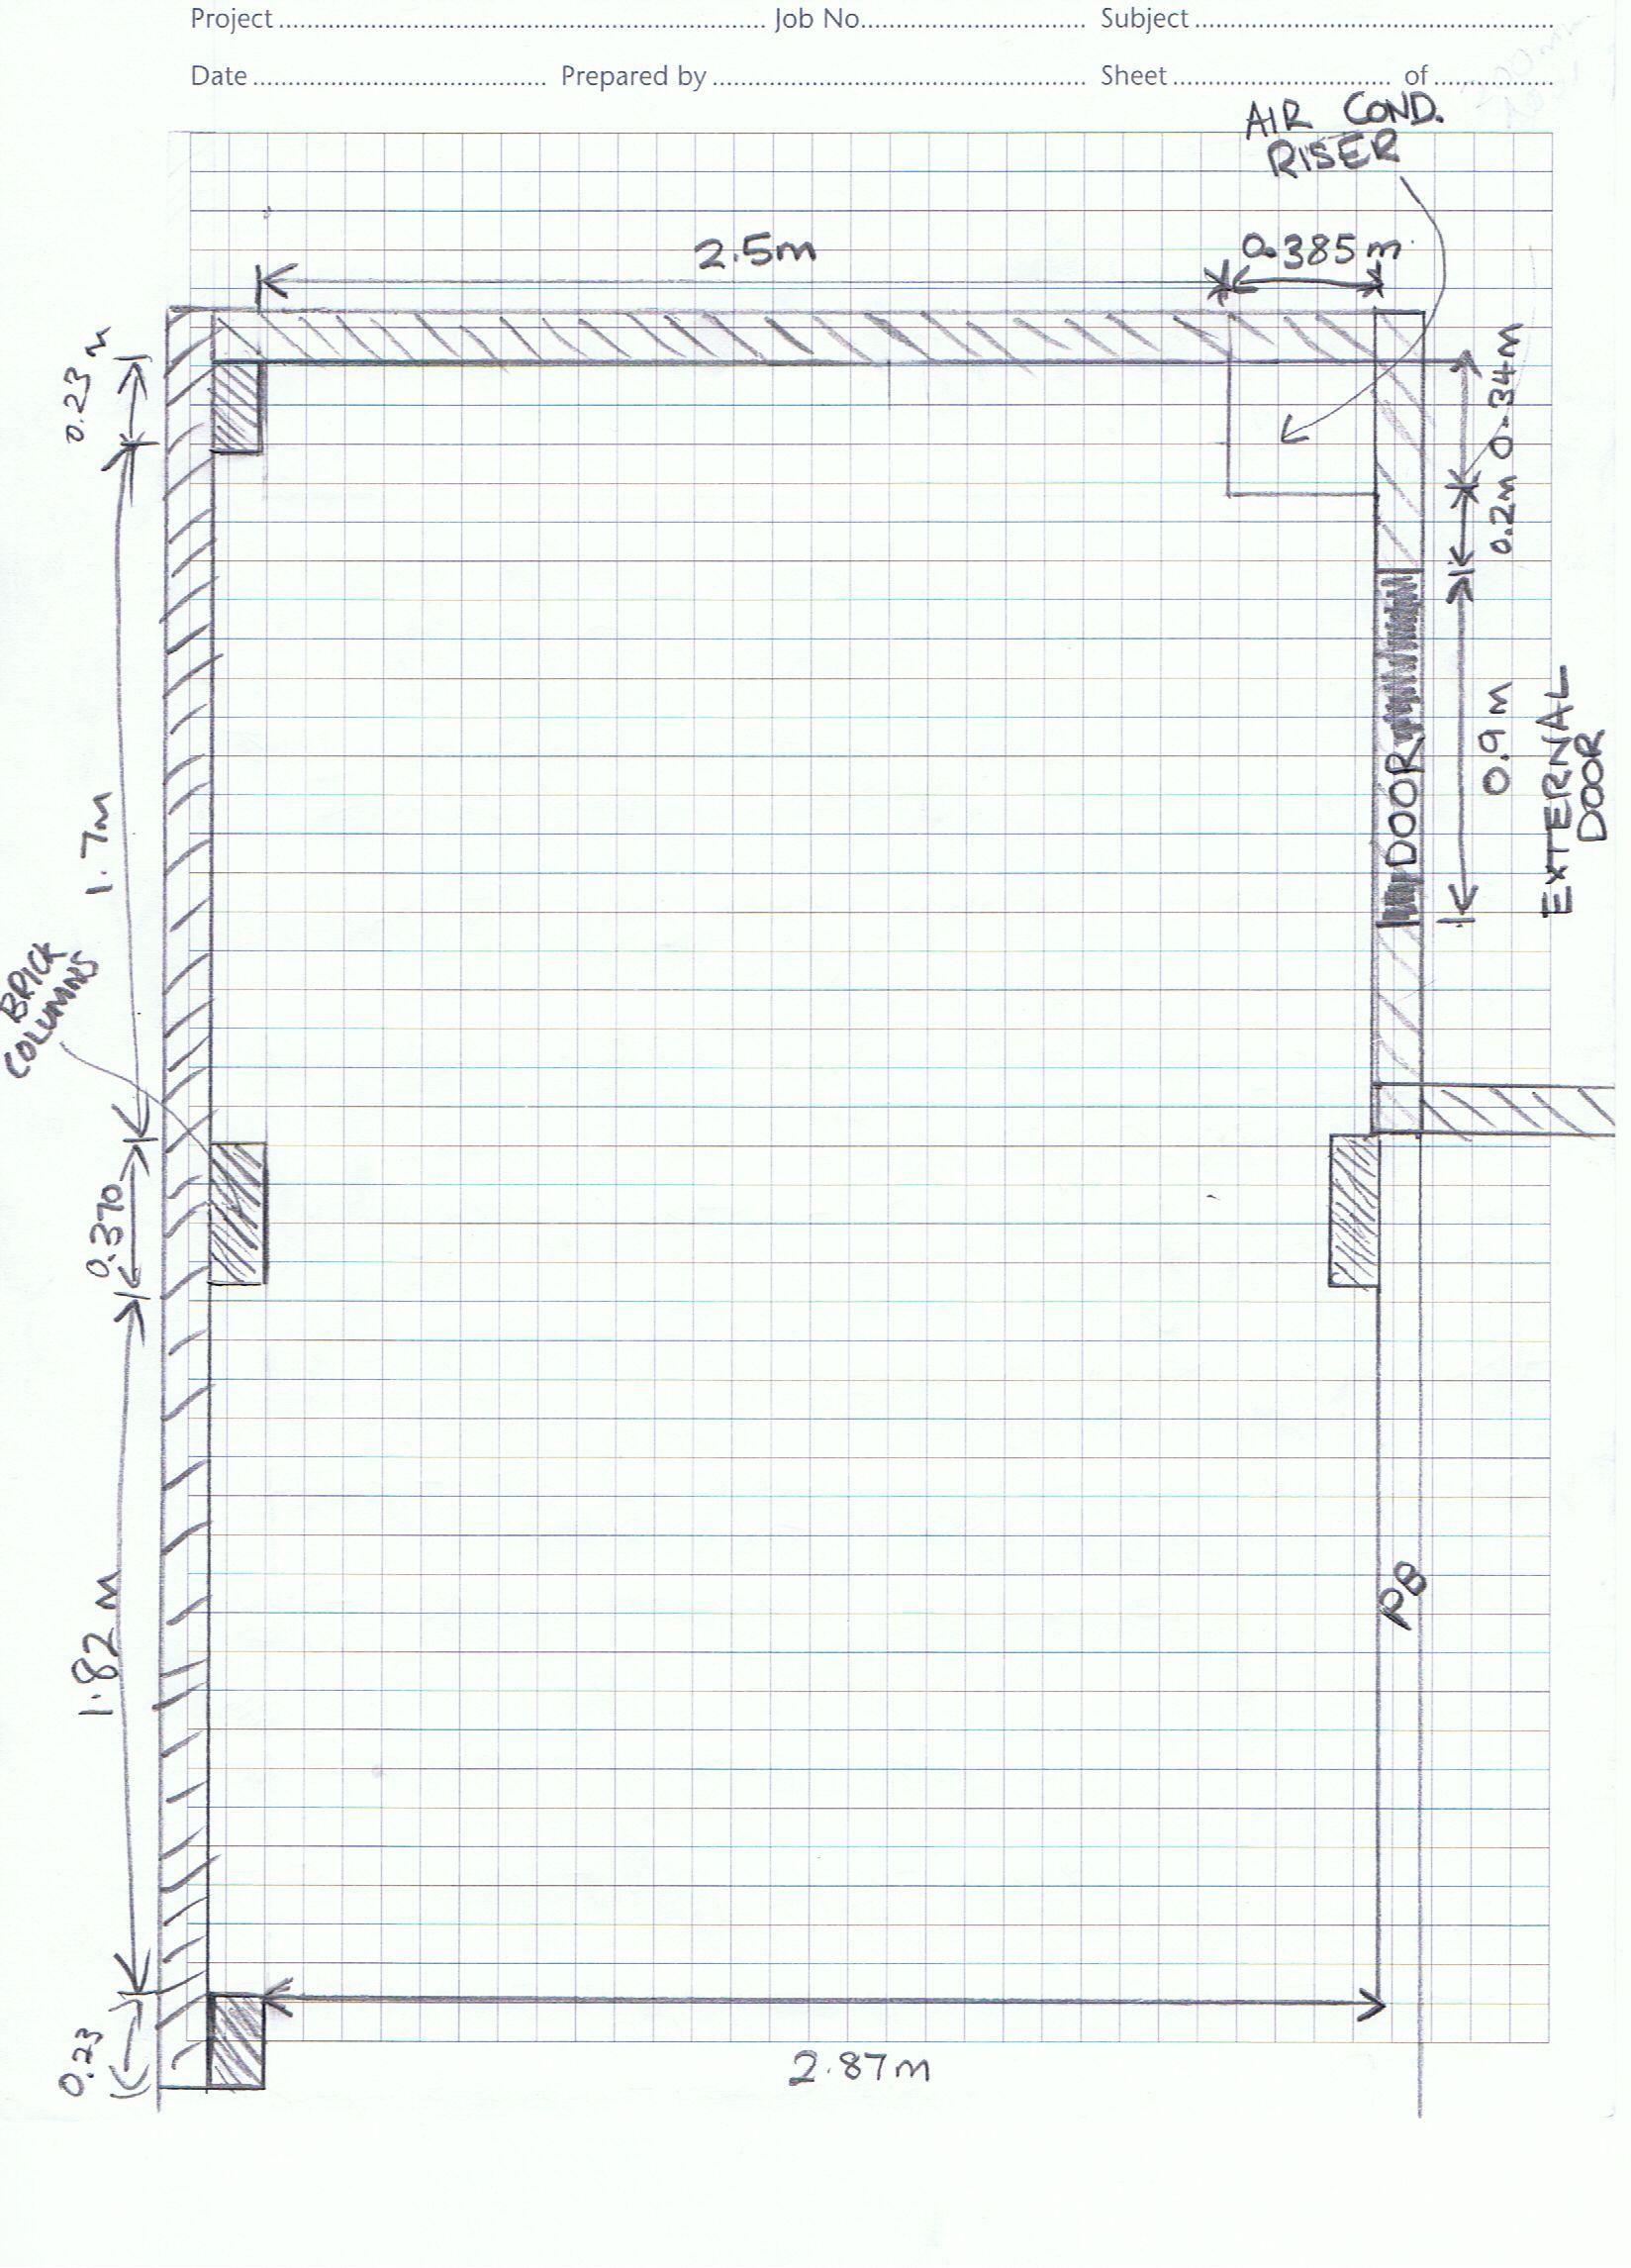 garage construction designs plans diy free download how to build garage construction designs